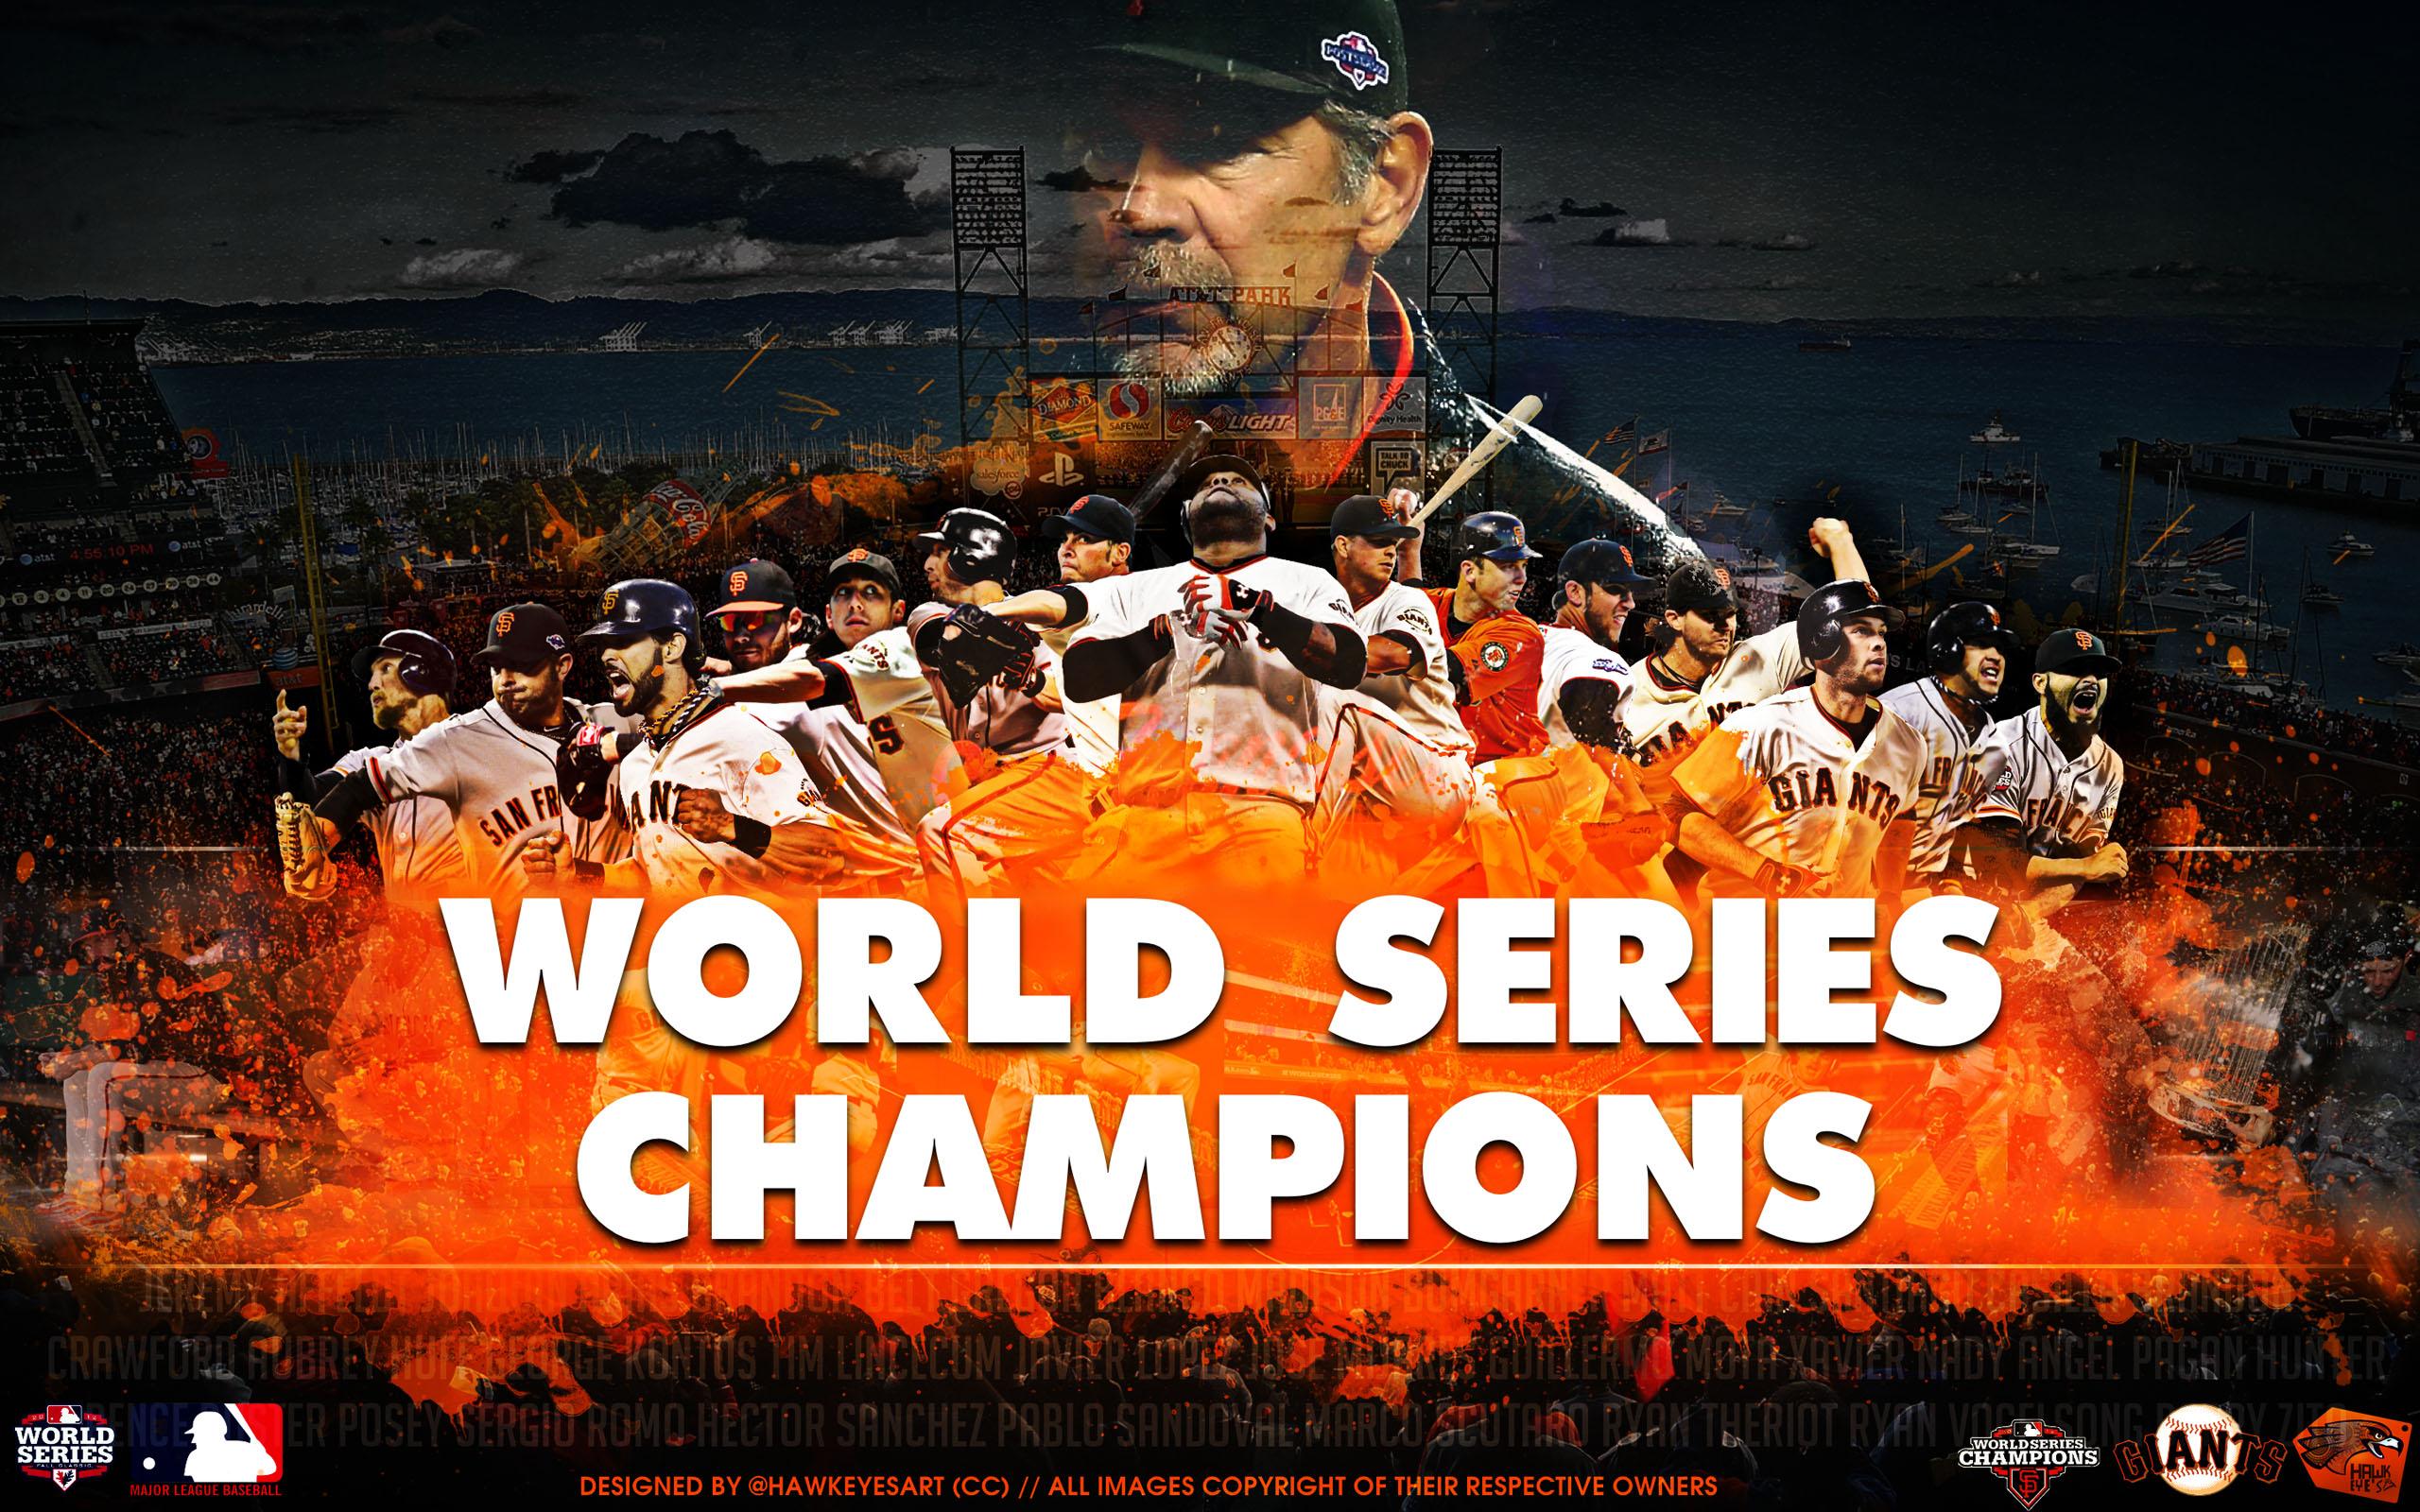 SAN FRANCISCO GIANTS mlb baseball 32 wallpaper 2560x1600 231999 2560x1600